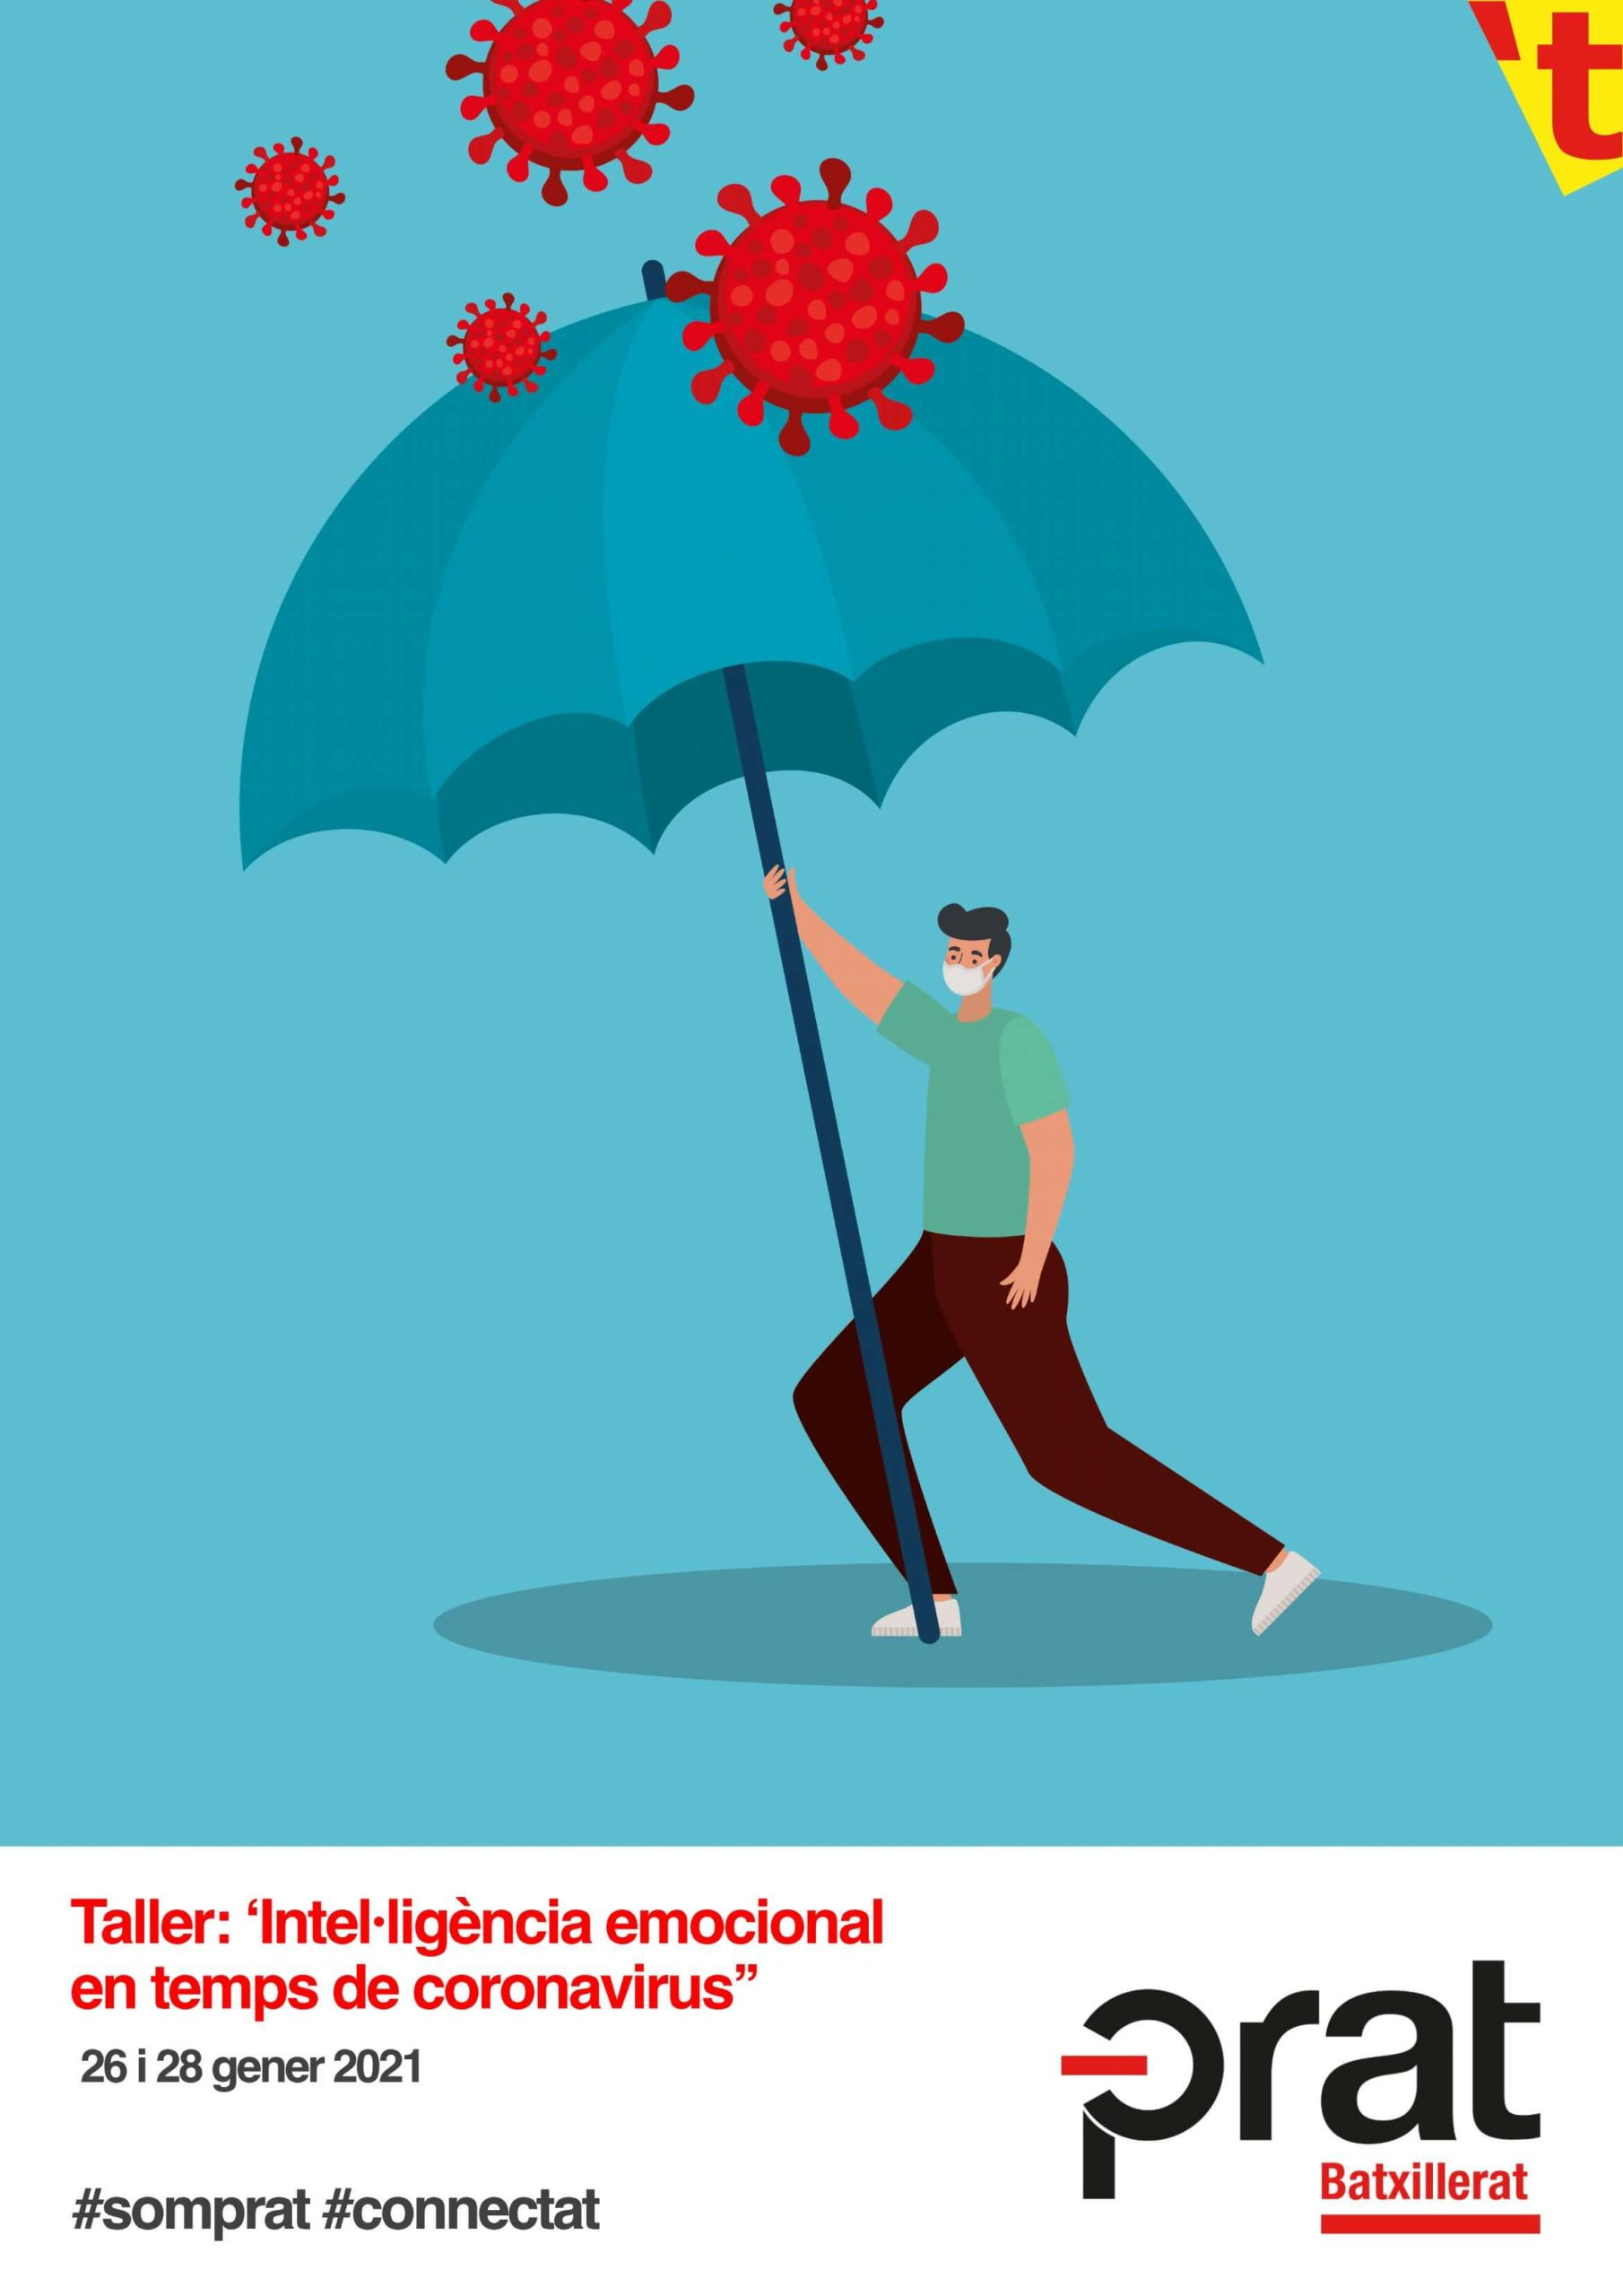 Taller d'Intel·ligència emocional en temps de coronavirus